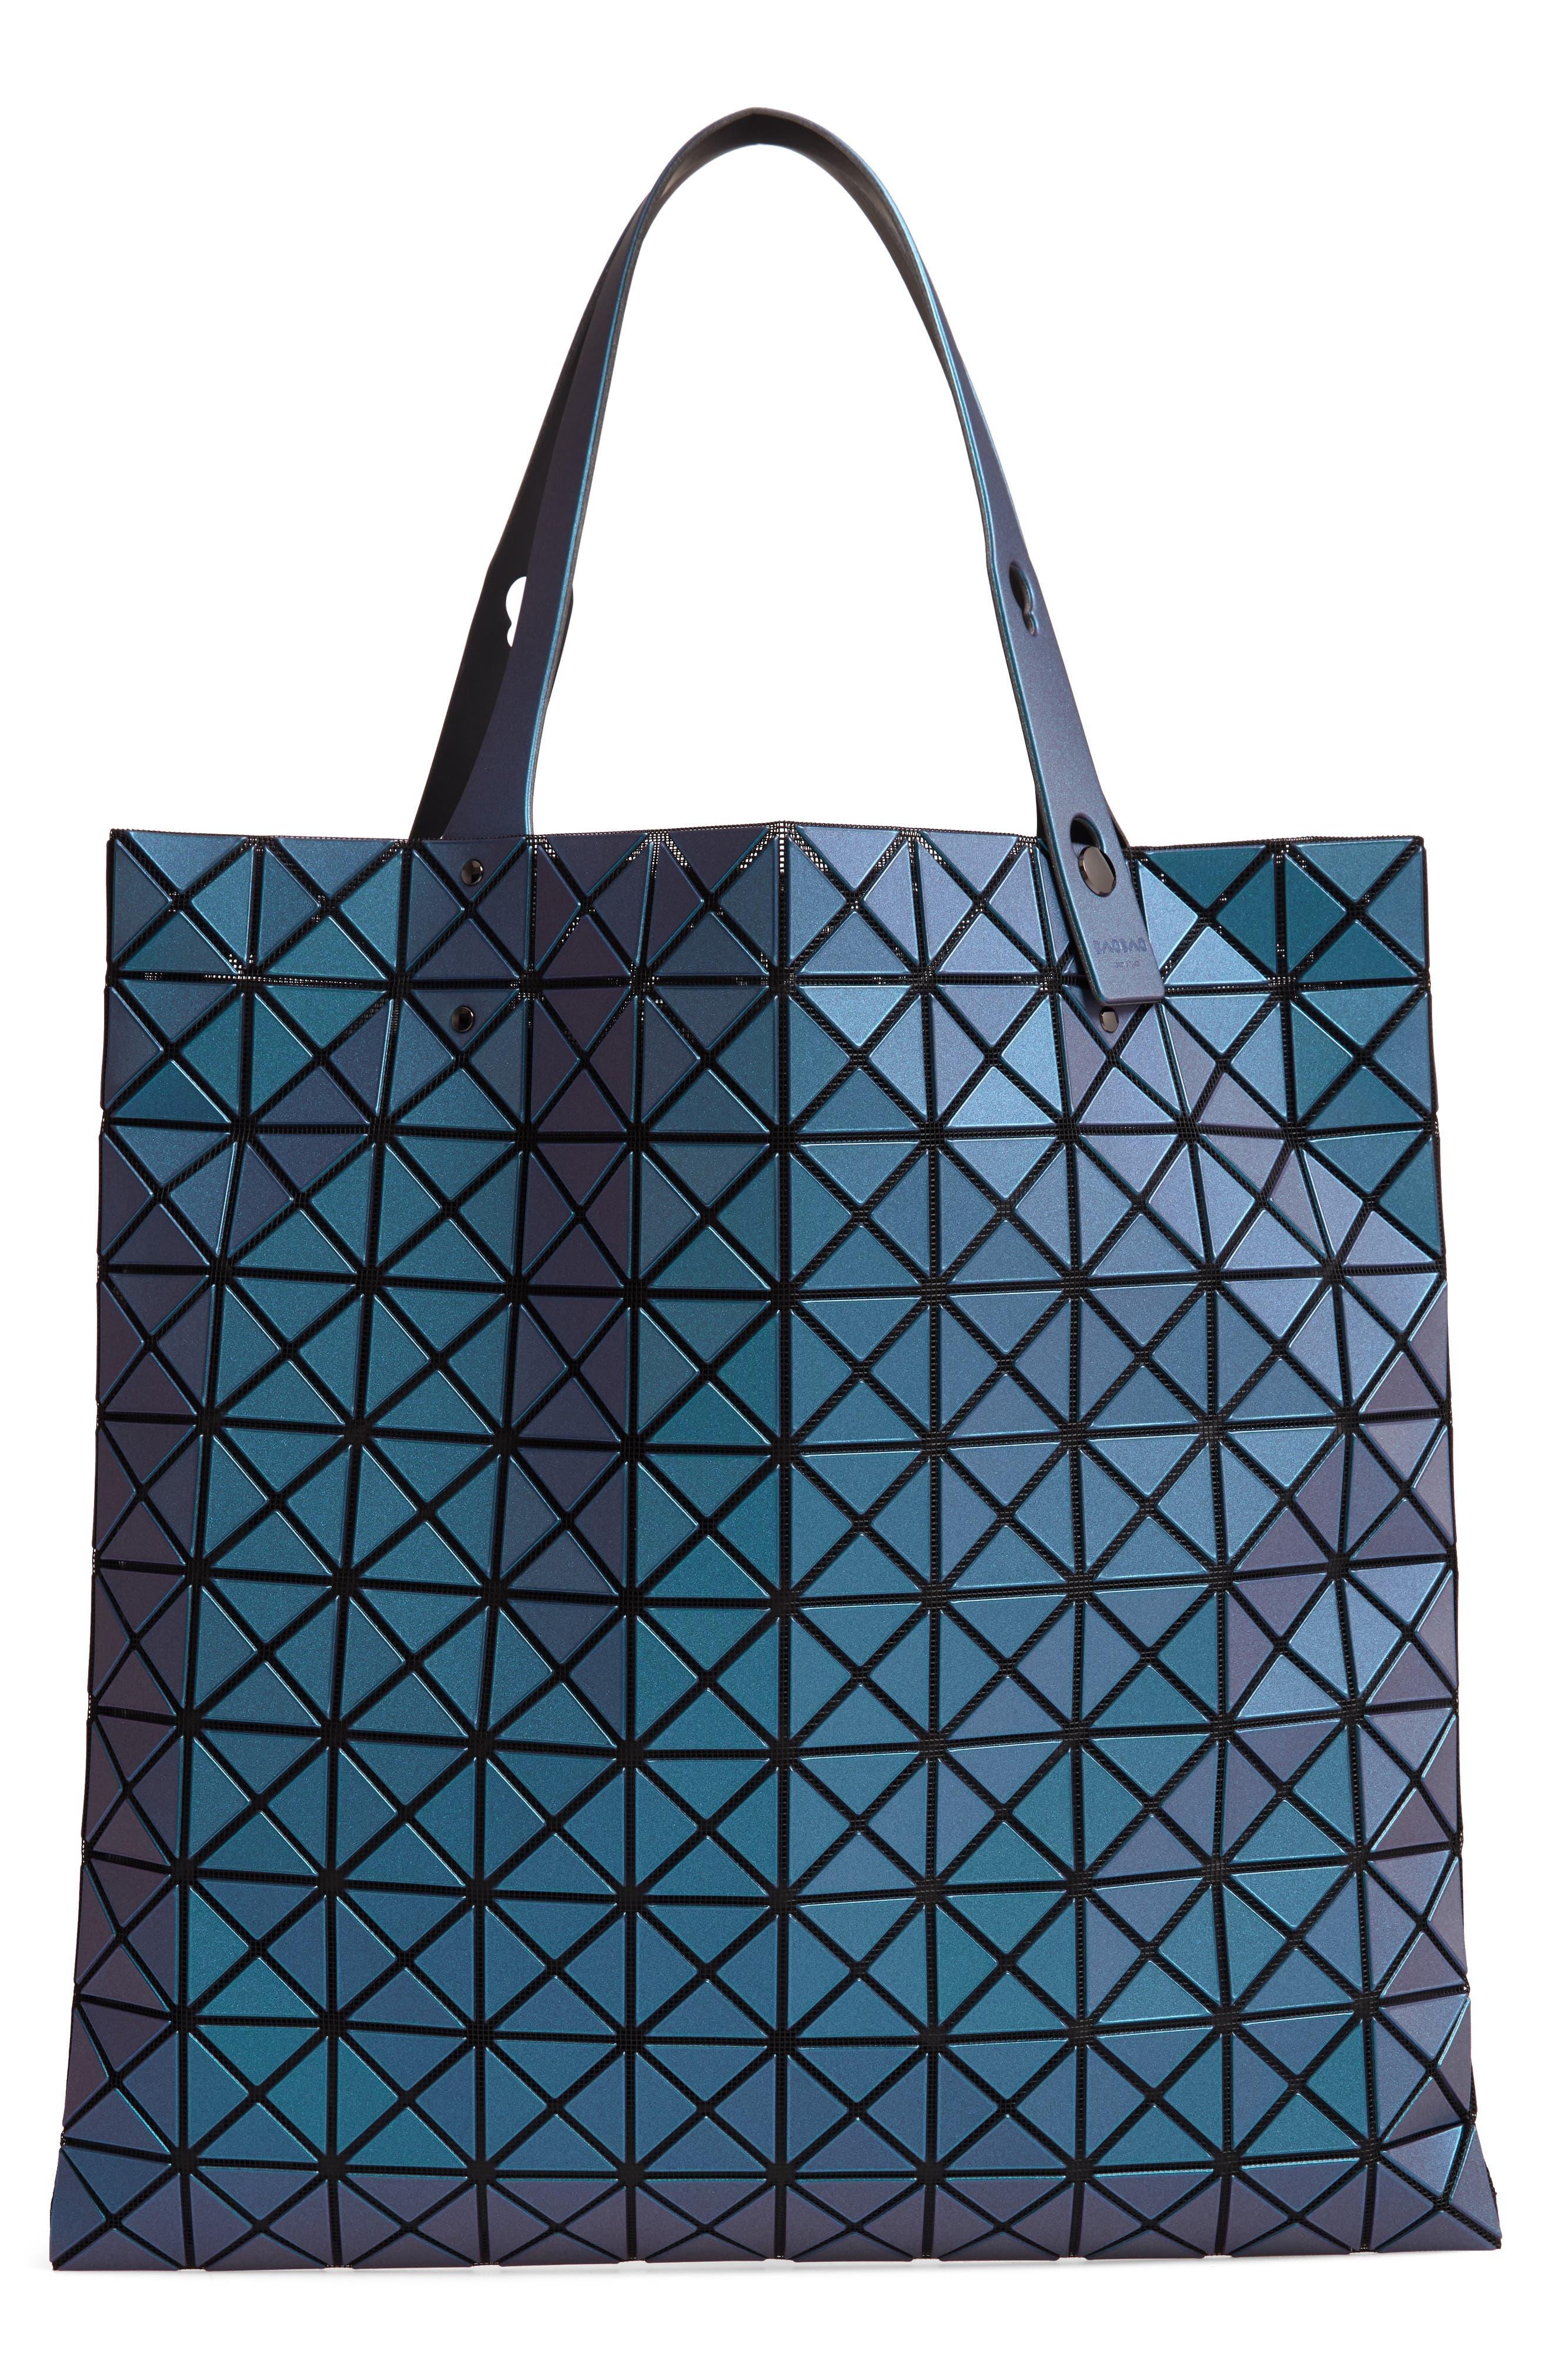 Prism Metallic Tote Bag,                             Main thumbnail 1, color,                             BLUE